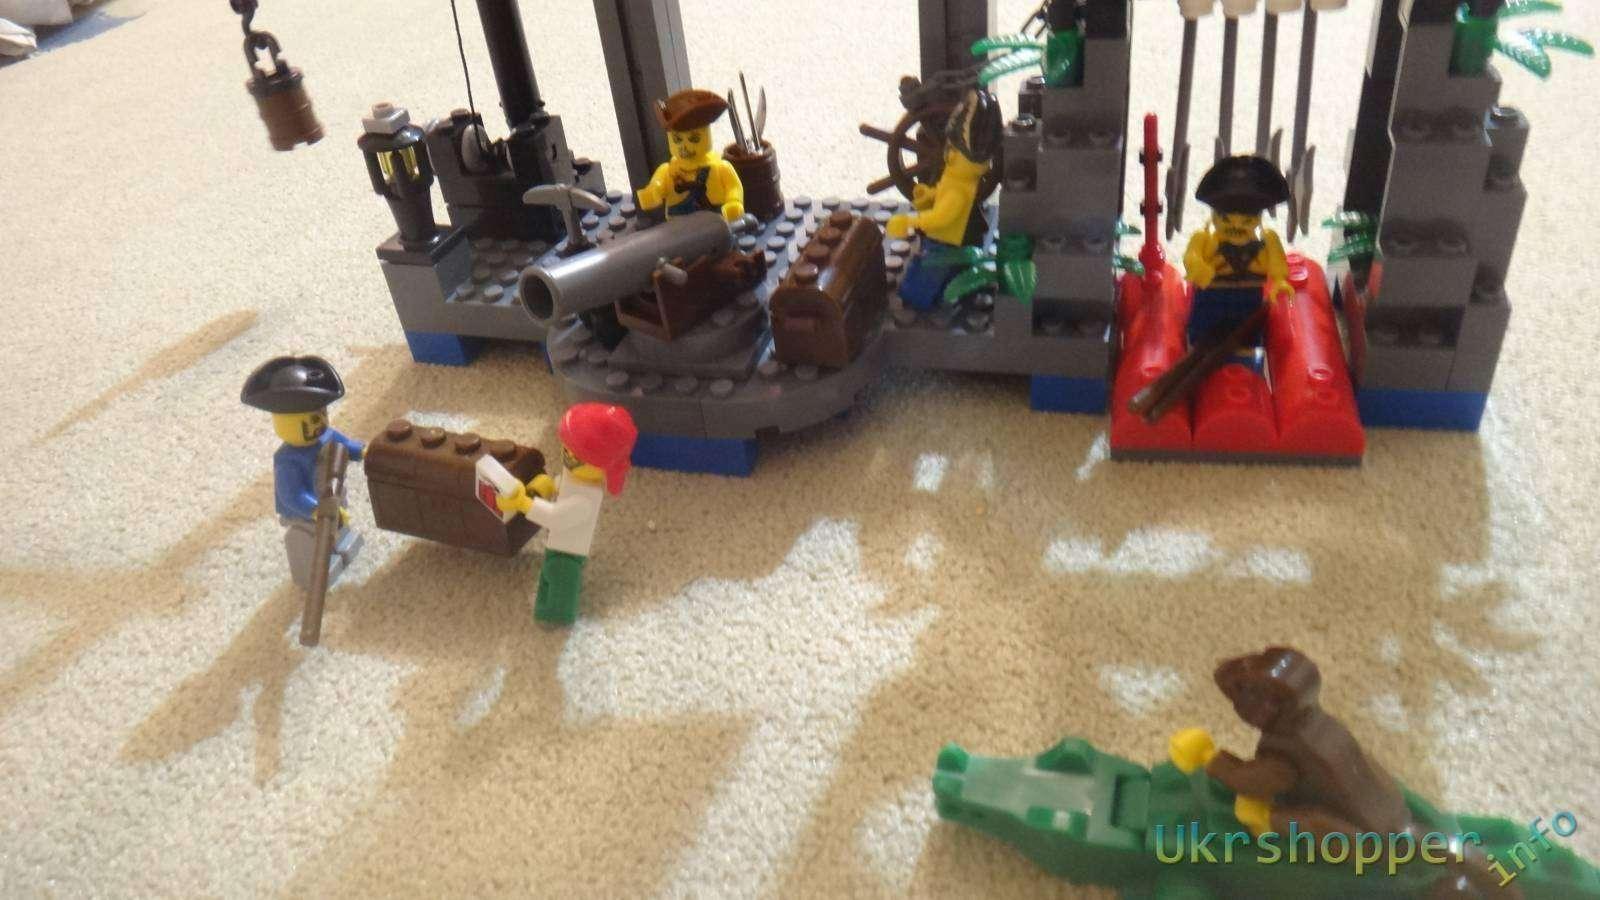 Aliexpress: Обзор конструктора 'Brick' пиратская серия: Деревня скелета